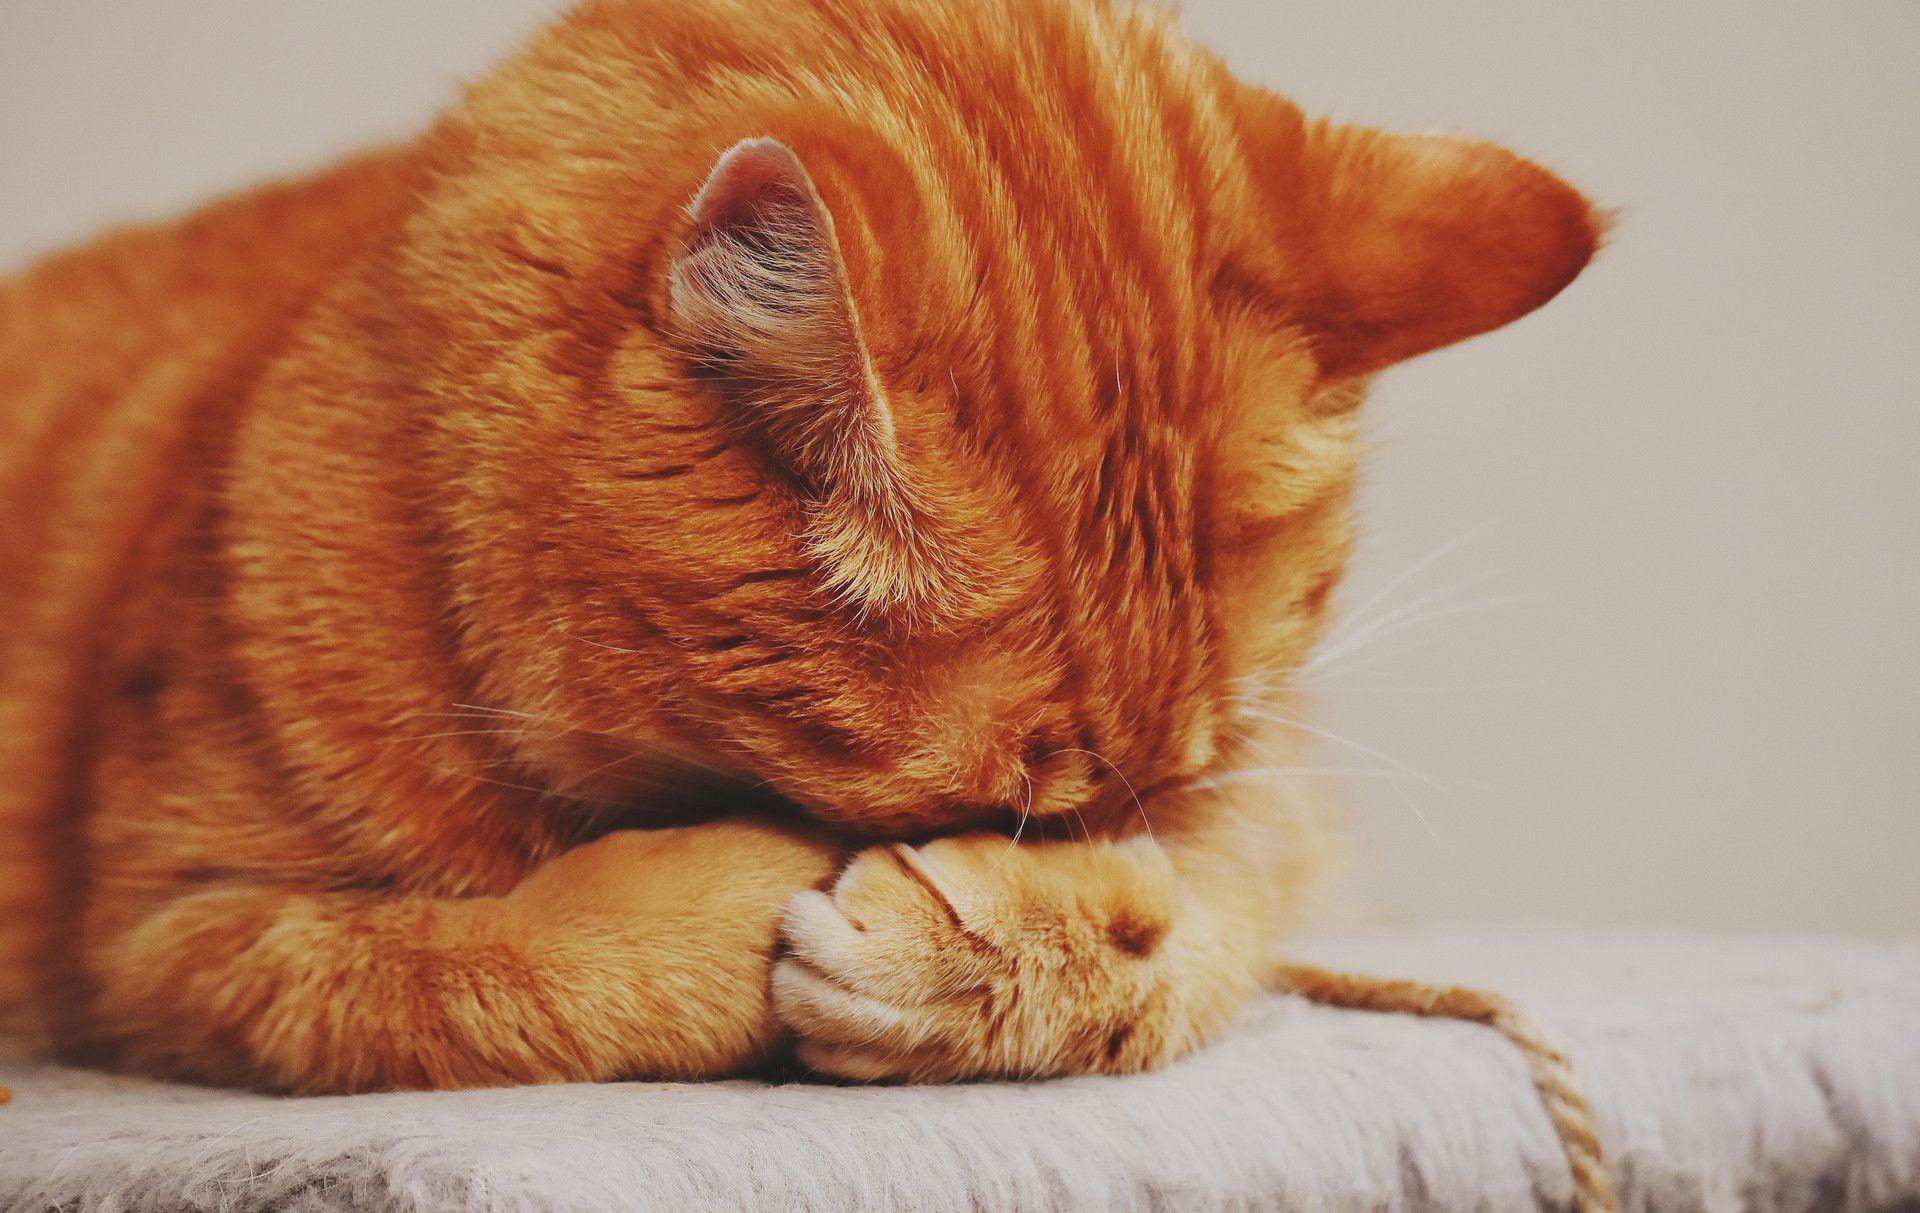 Tabby cat having an emotional day